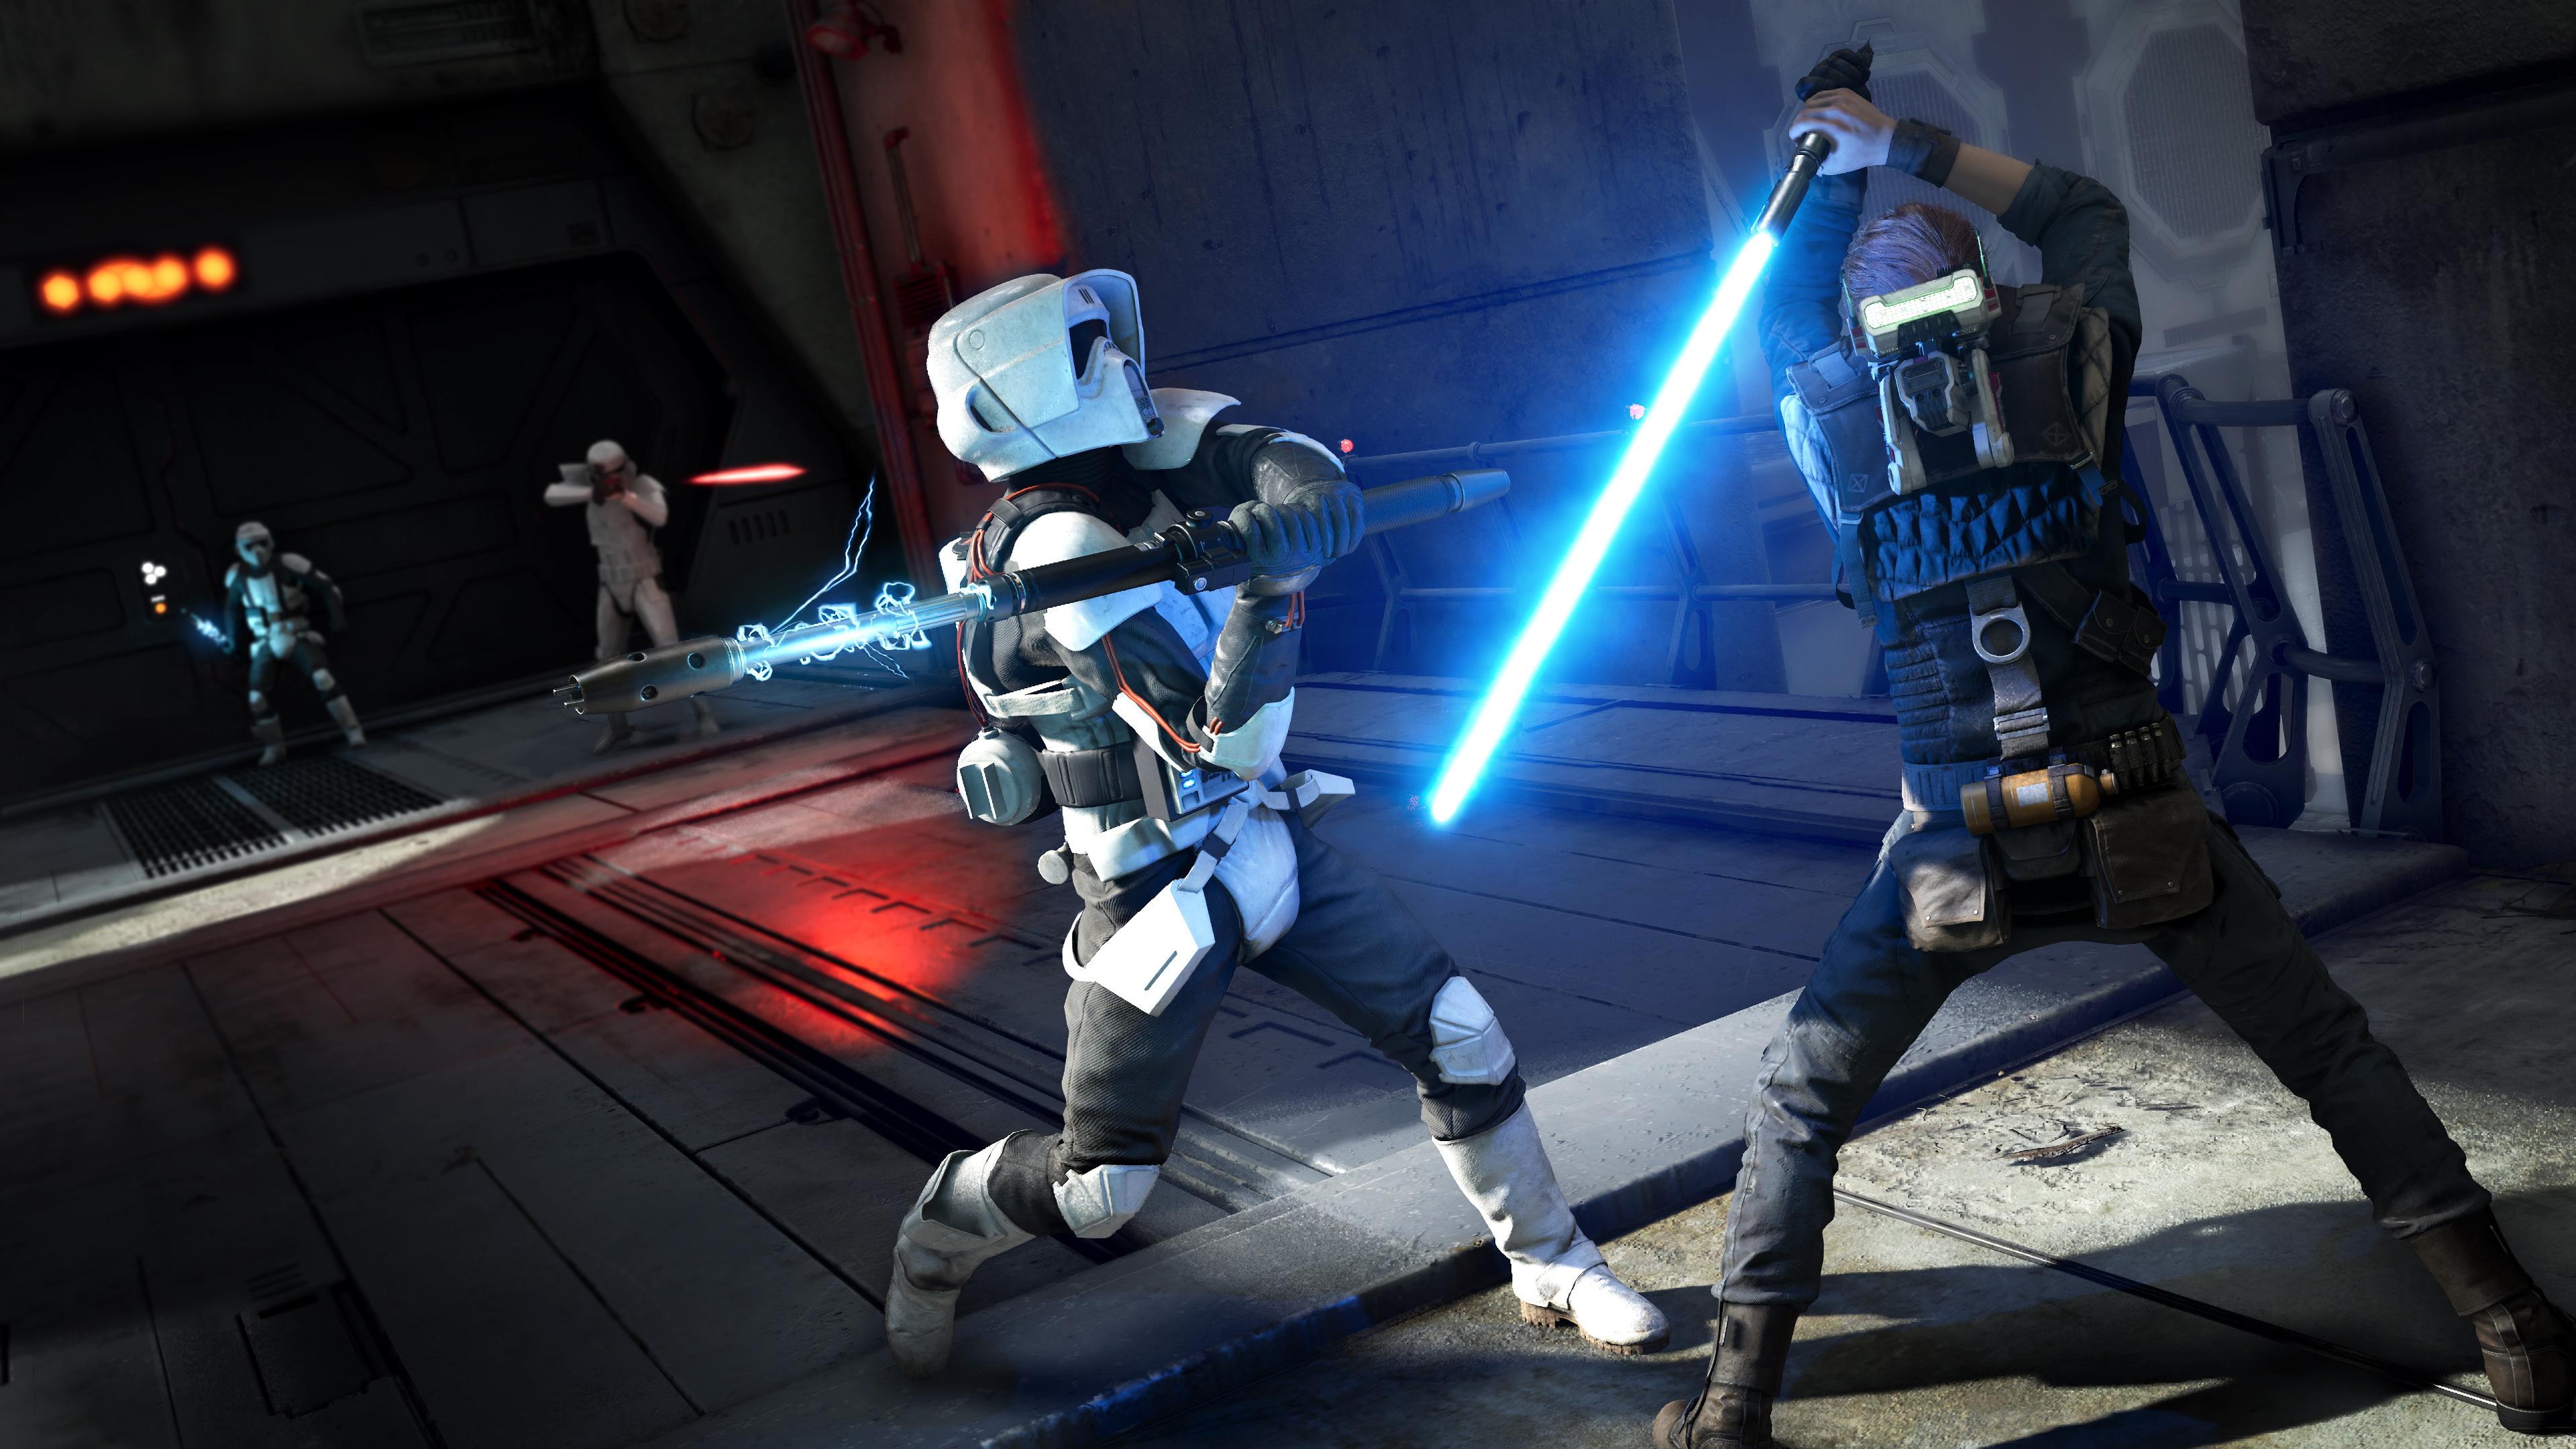 Star Wars Jedi Fallen Order Lightsaber Battle 4k Wallpaper 12